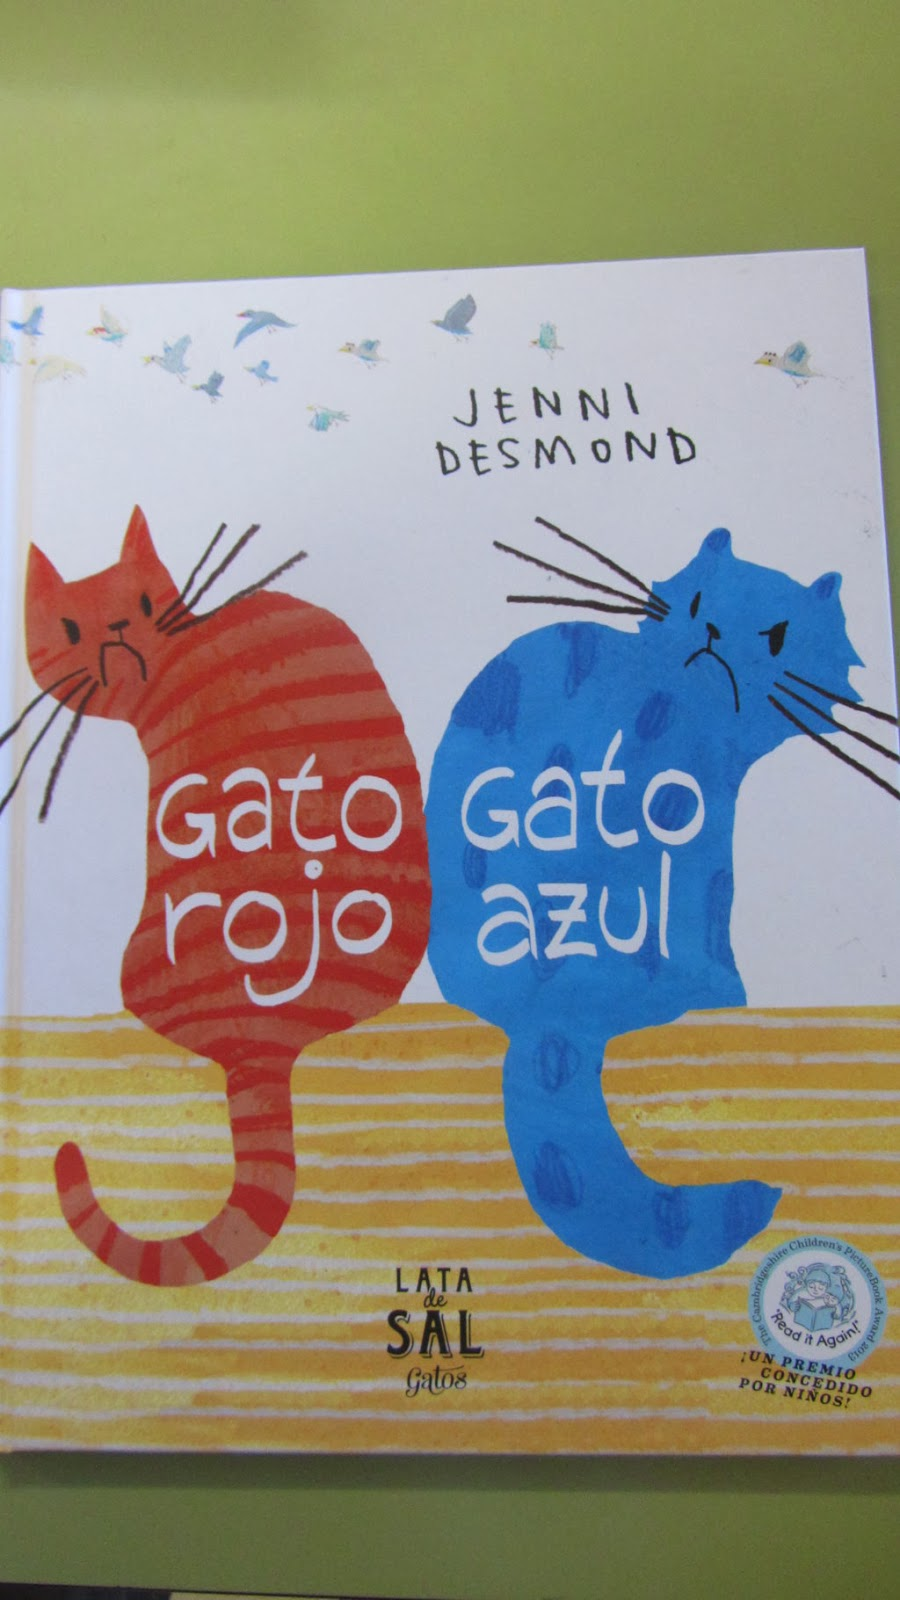 http://issuu.com/latadesal/docs/gato_rojo__gato_azul